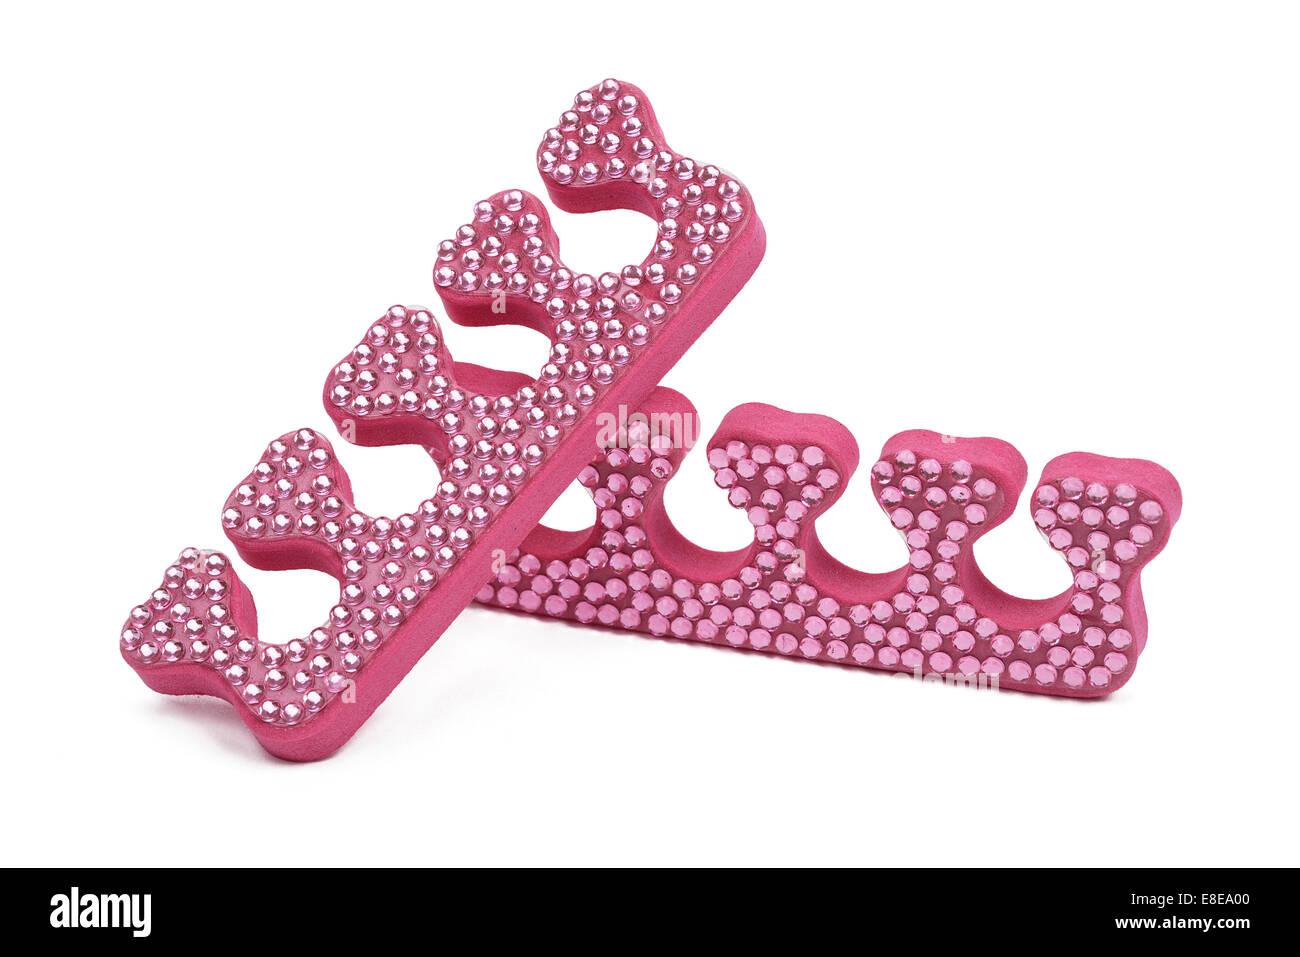 Pink foam diamante toe spacers - Stock Image